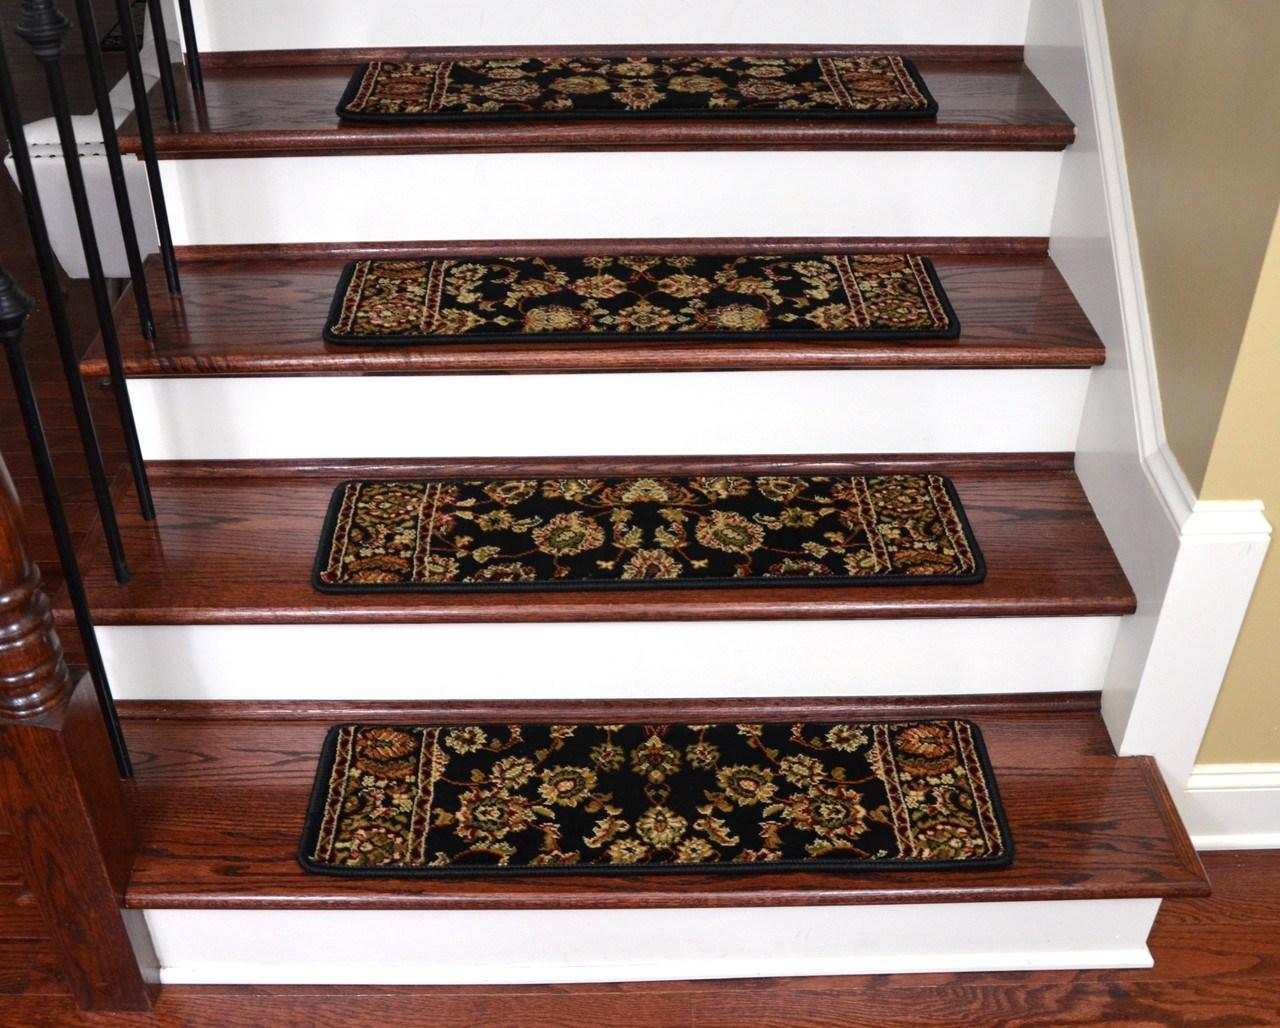 Keshan Ebony Non Slip Carpet Stair Treads 31 X 9   Cheap Carpet Stair Treads   True Bullnose   Hallway Carpet   Carpet Runners   Slip Resistant   Bullnose Carpet